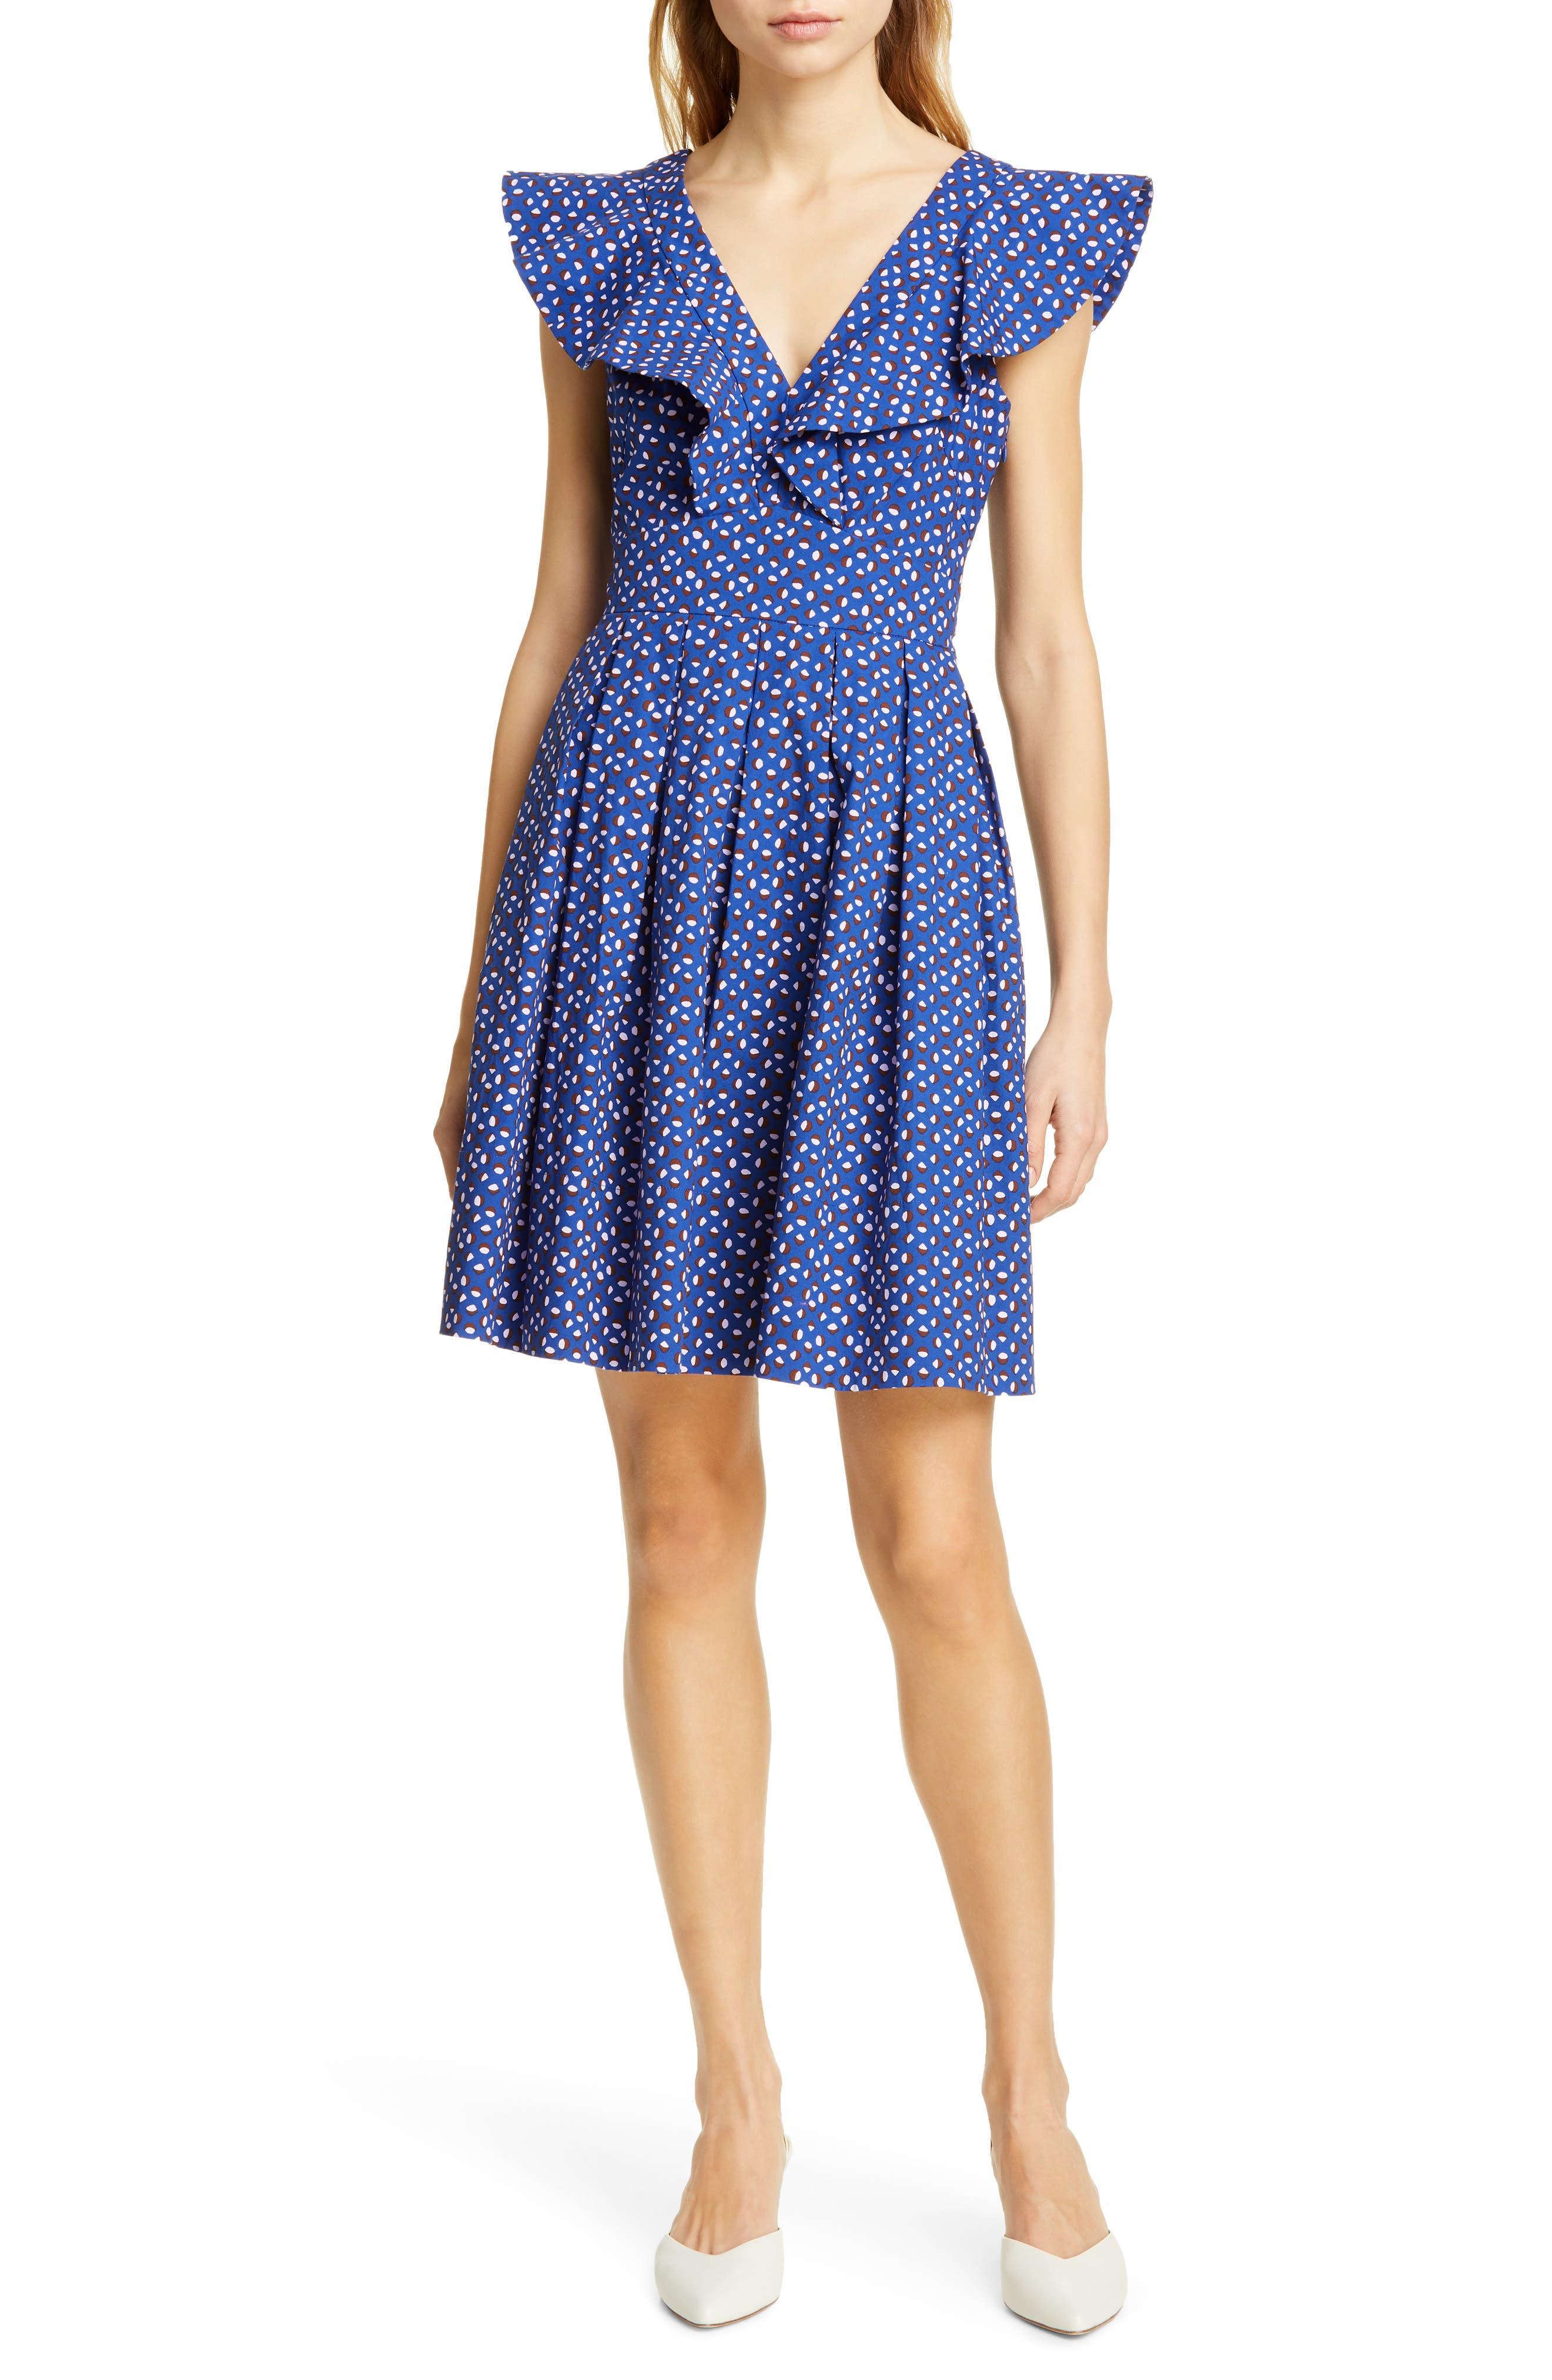 Kate Spade New York Geo Dot Party Dress, Blue